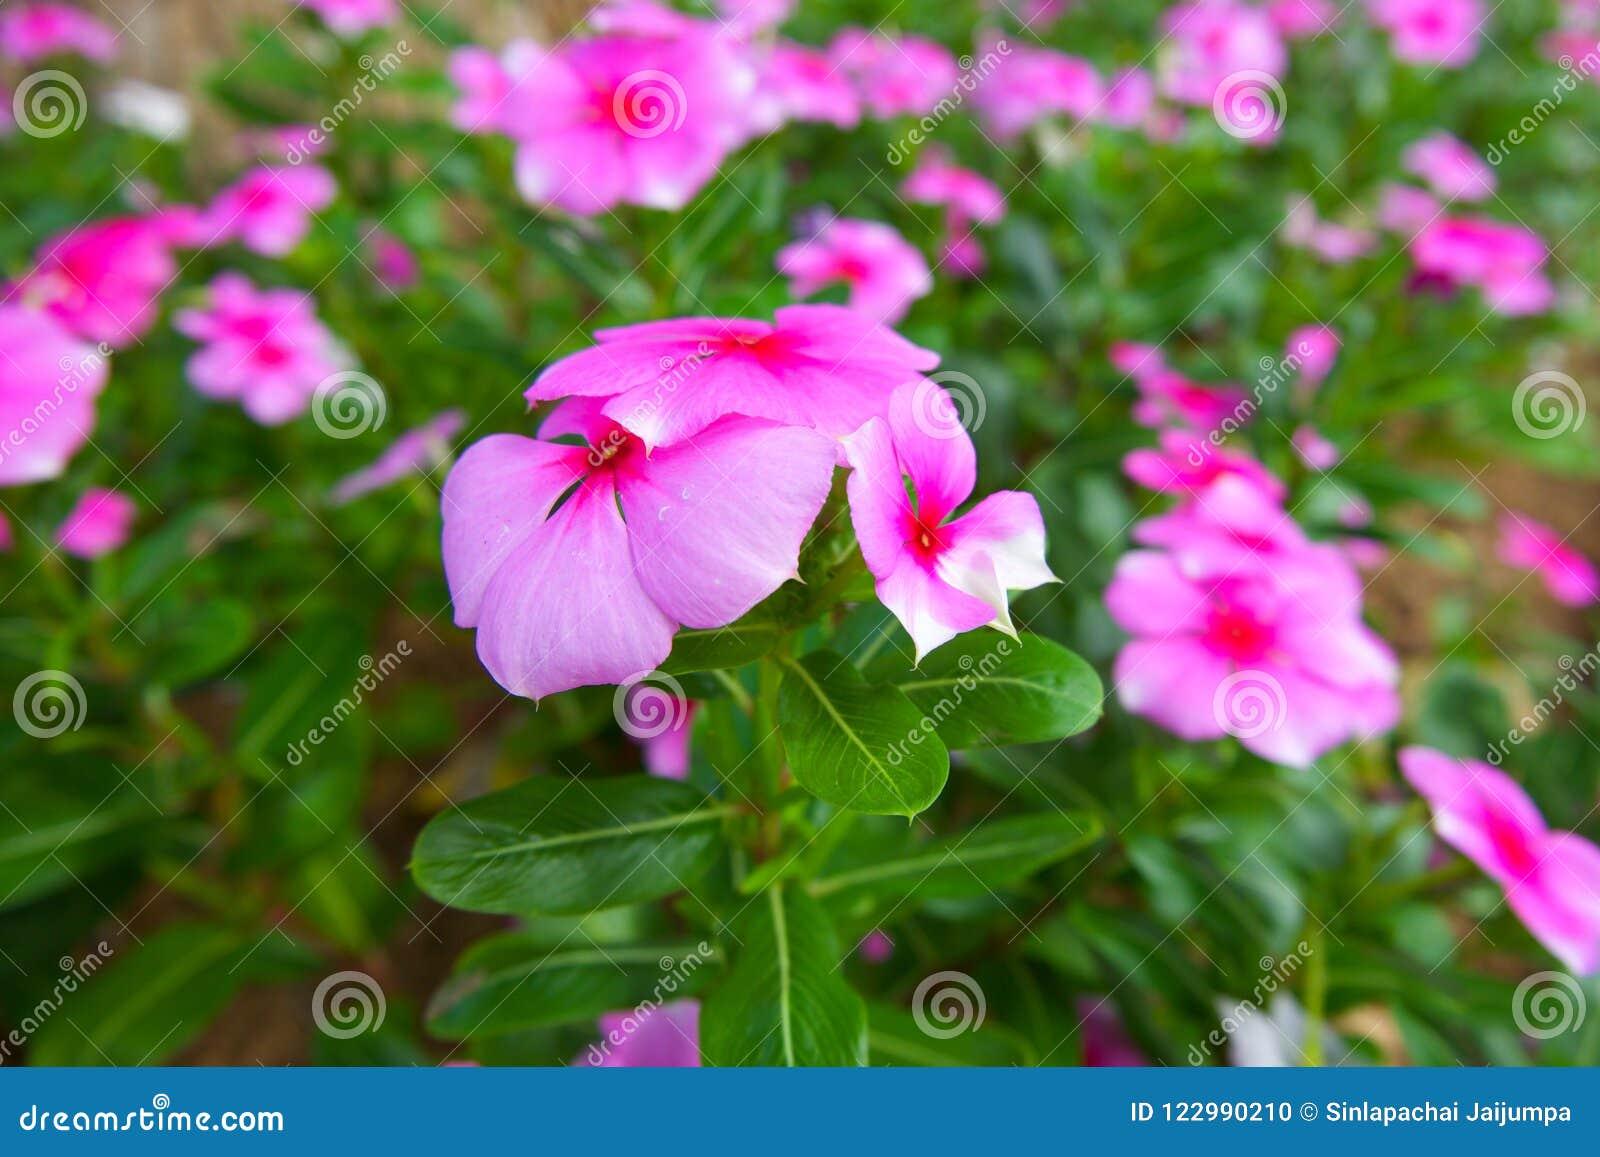 Beautiful Pink Vinca Flowers. Cape Periwinkle, Madagascar ...